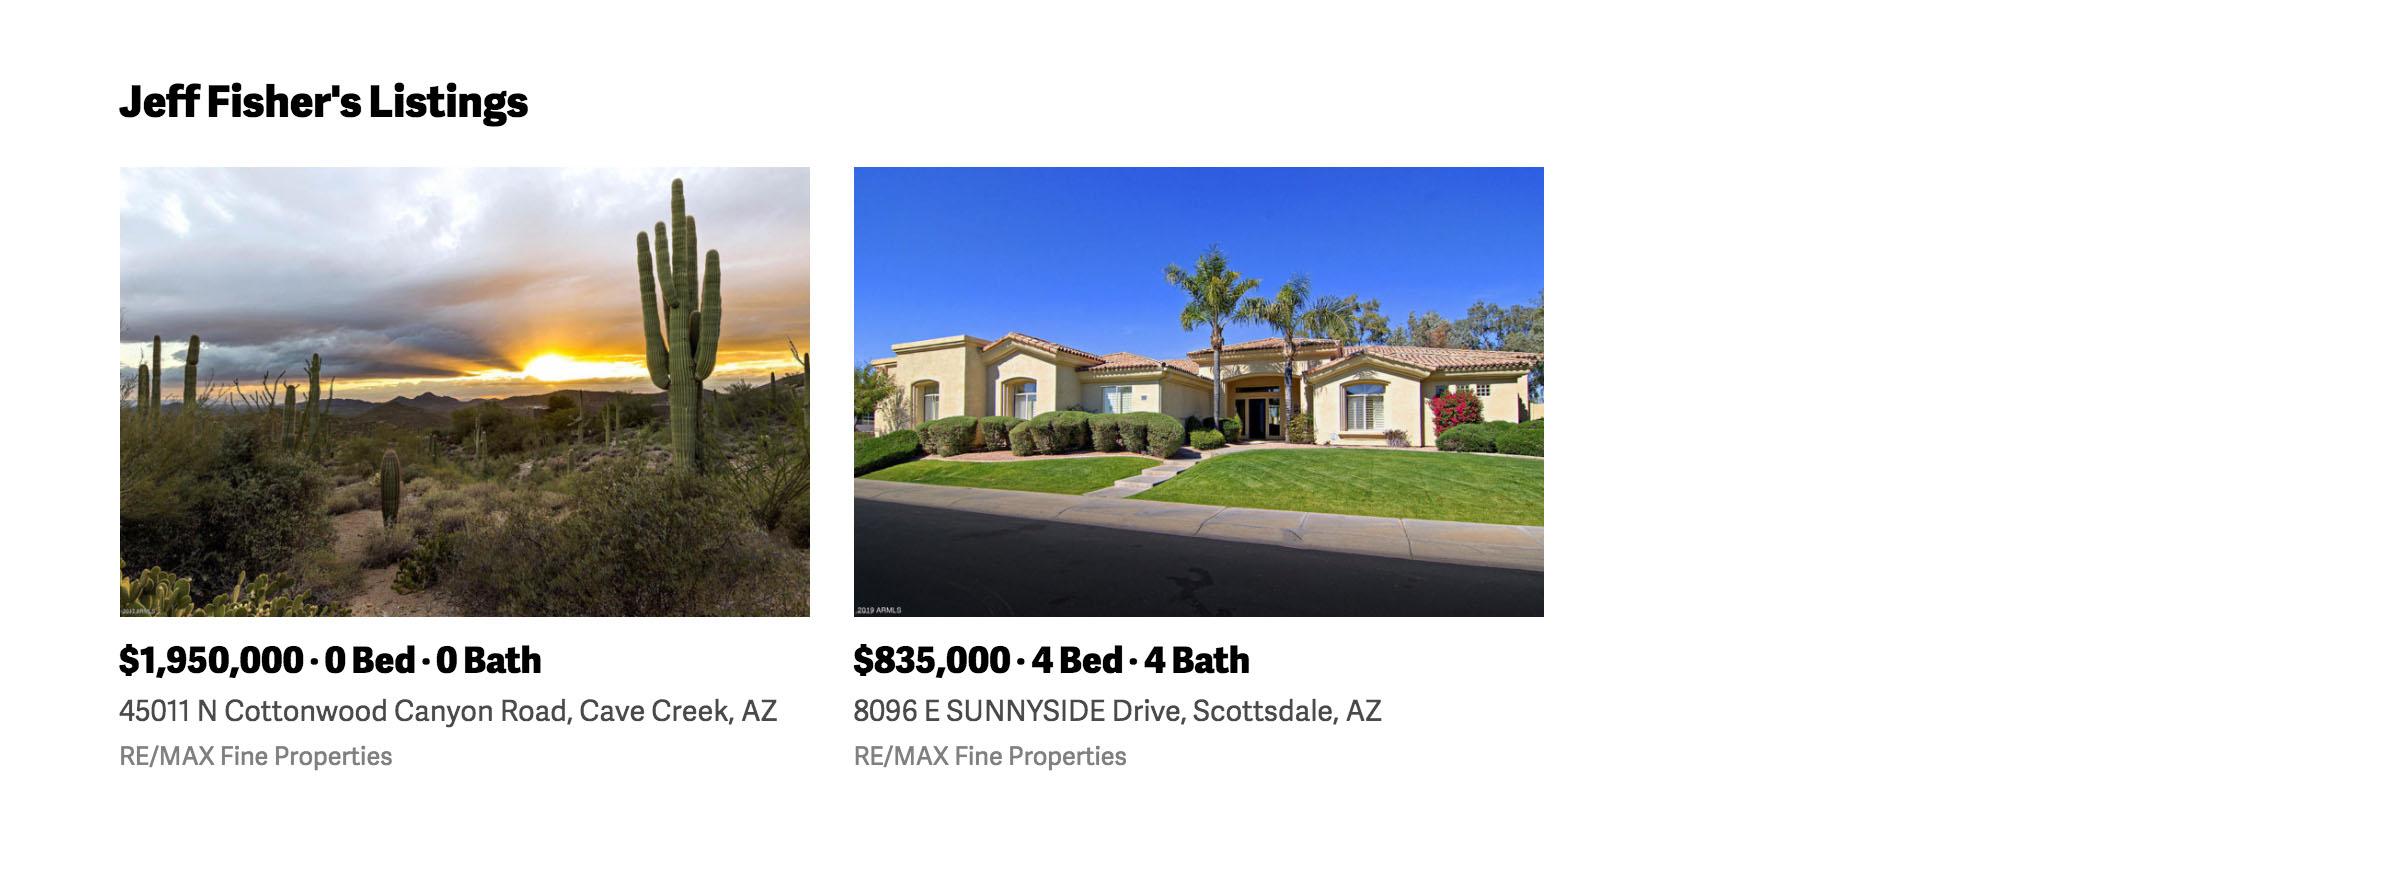 Agent listings on PropertySimple